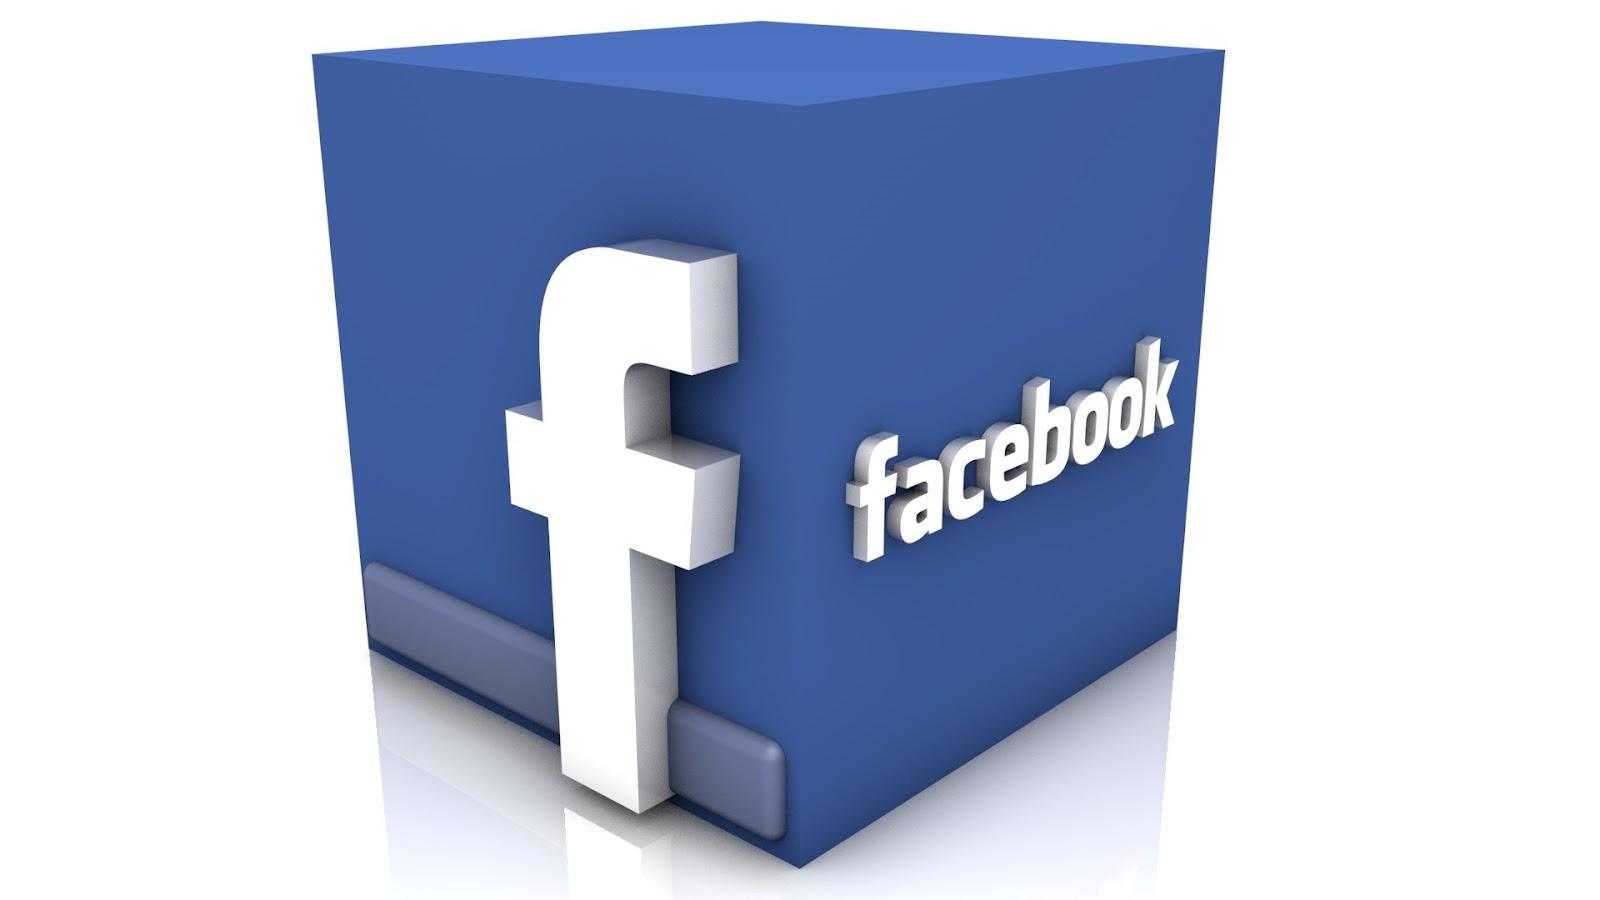 Estamos também ao seu dispor na plataforma facebook, onde nos pode contactar pelo chat